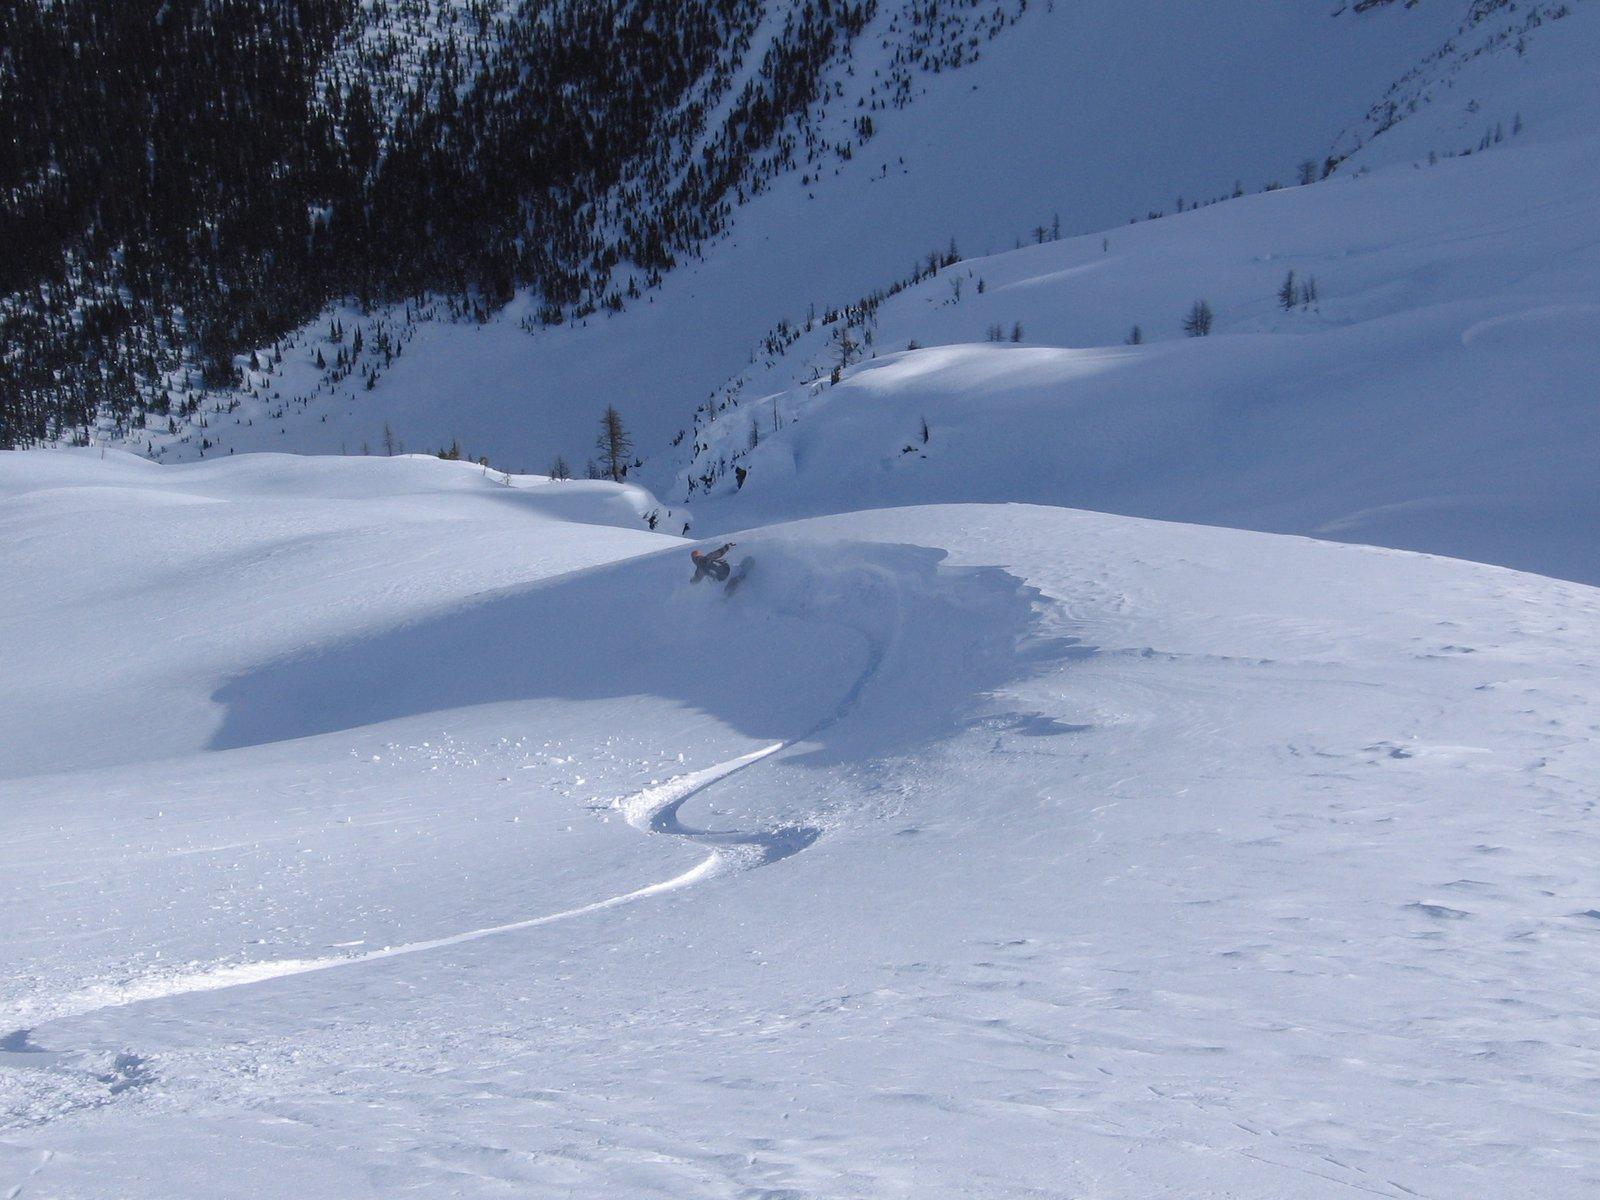 Snowboard Porn